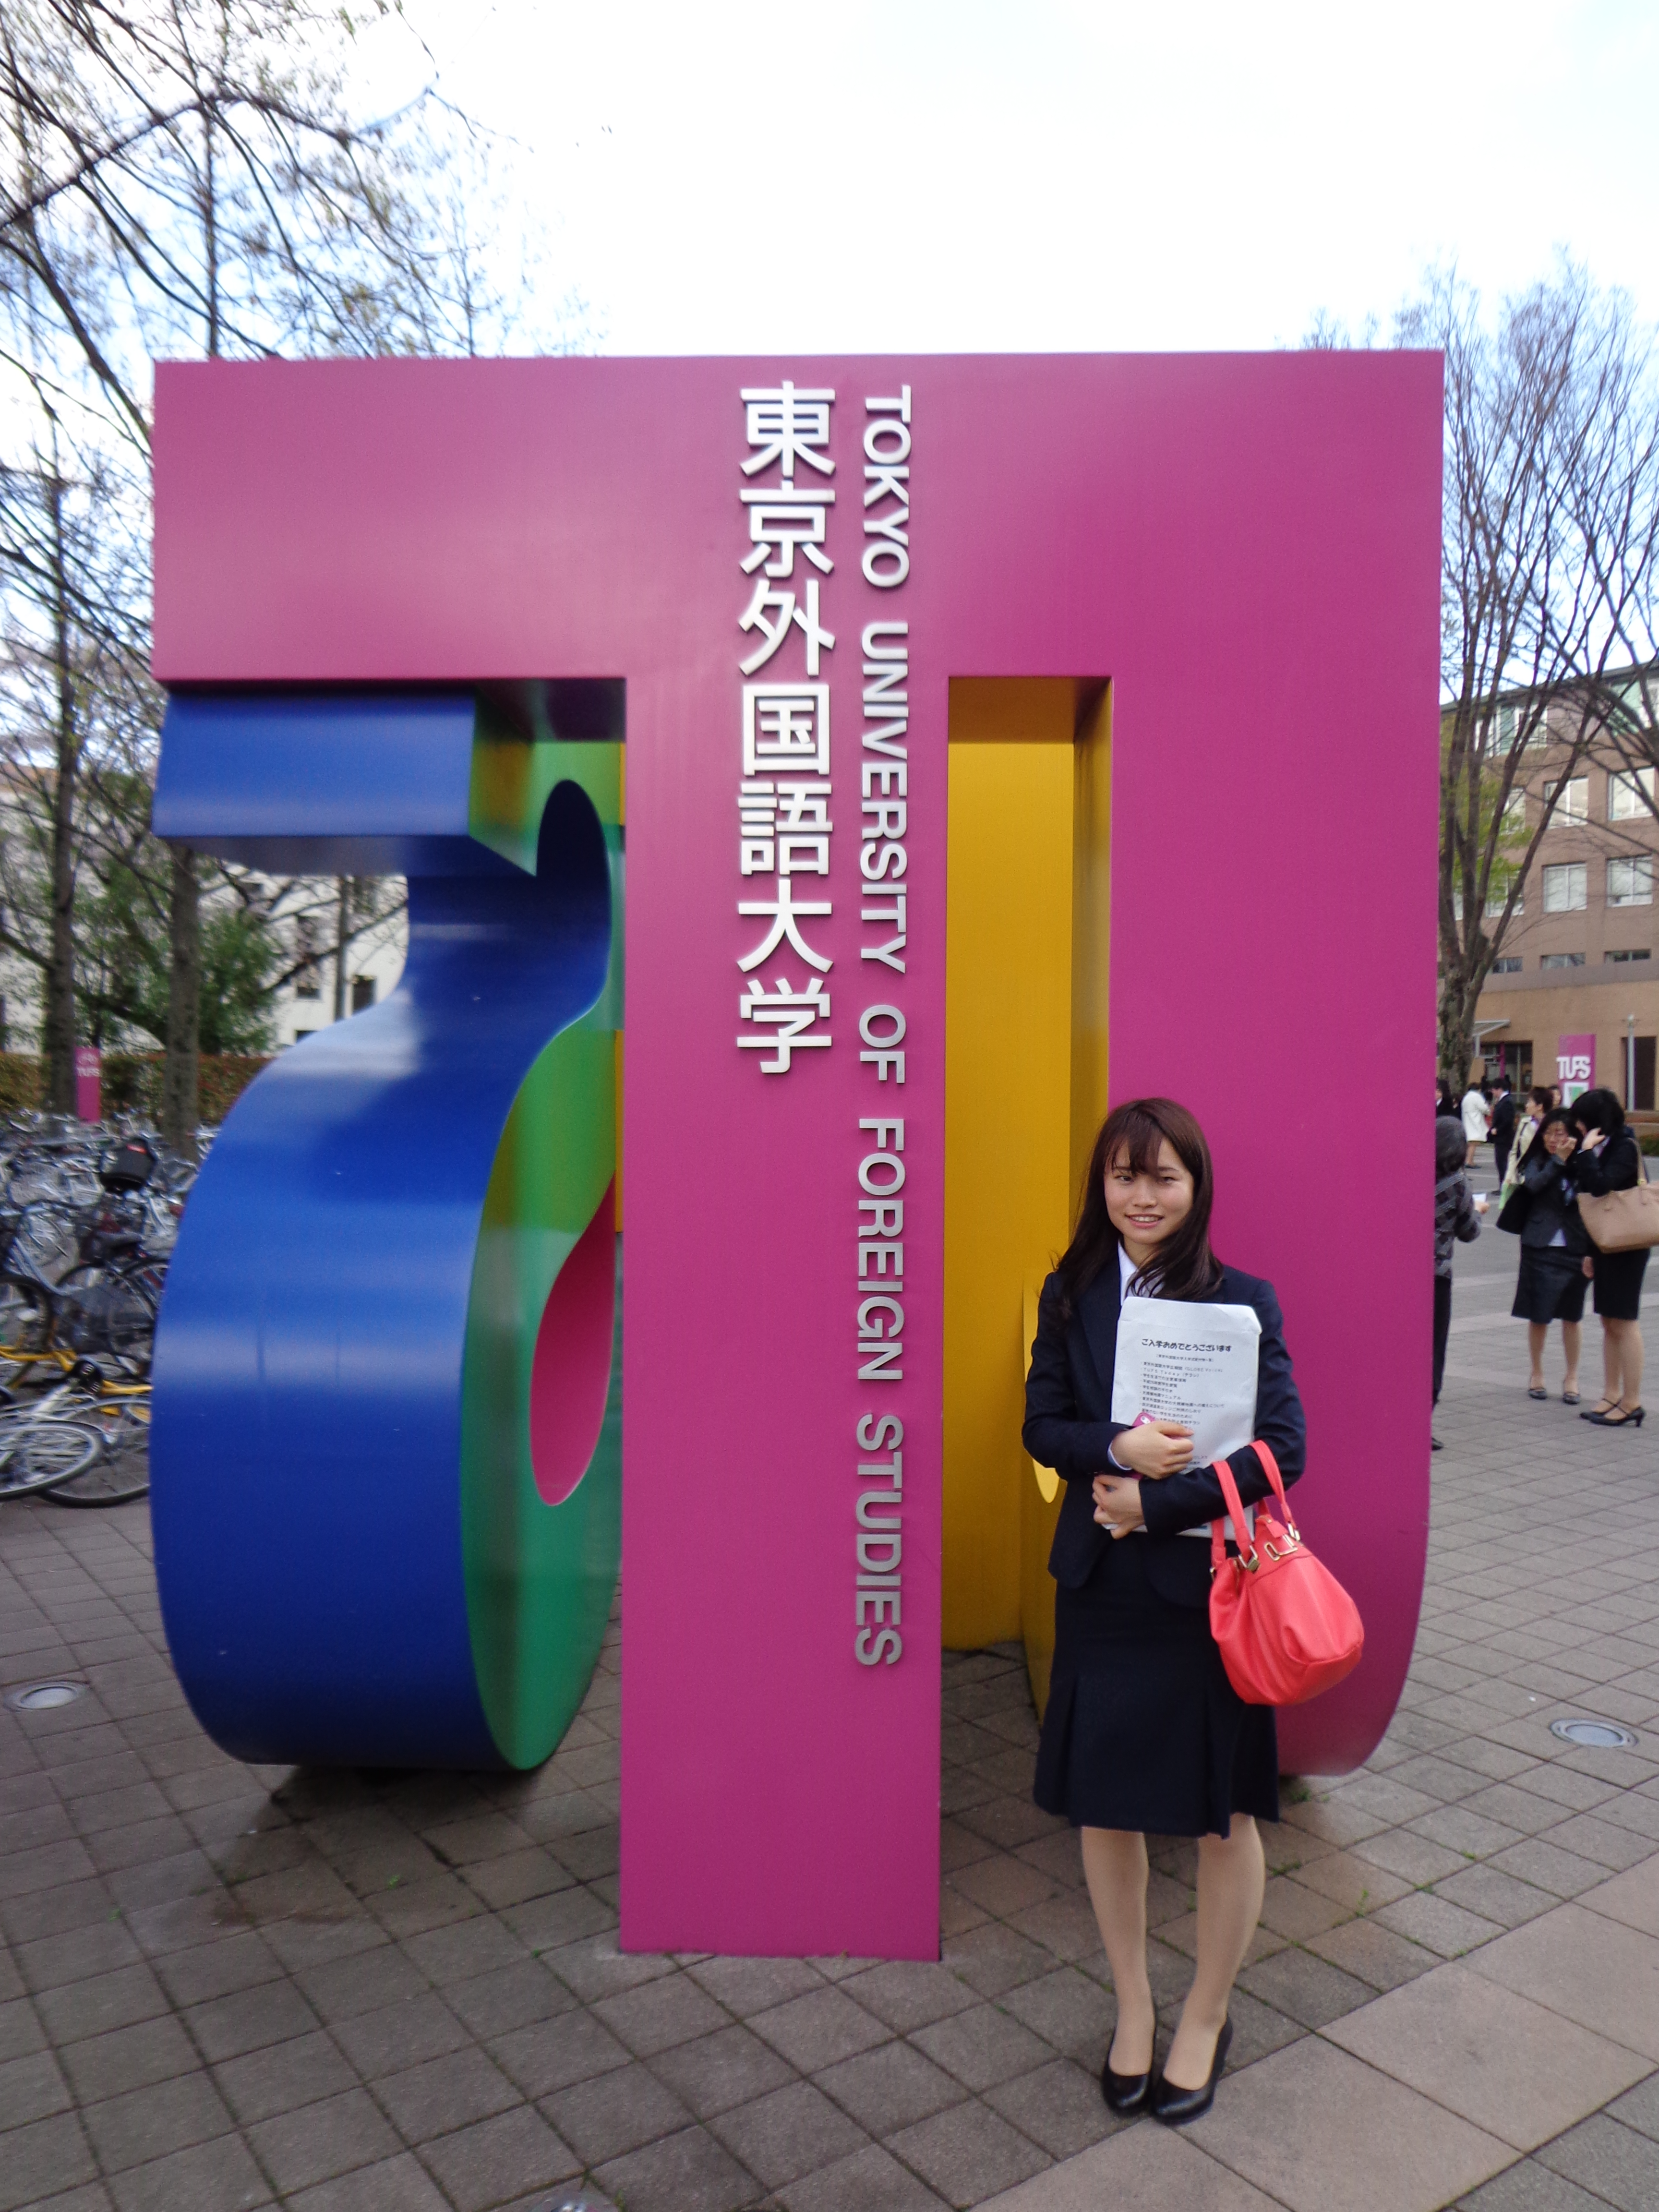 Yukino at Tokyo University of Foreign Languages.